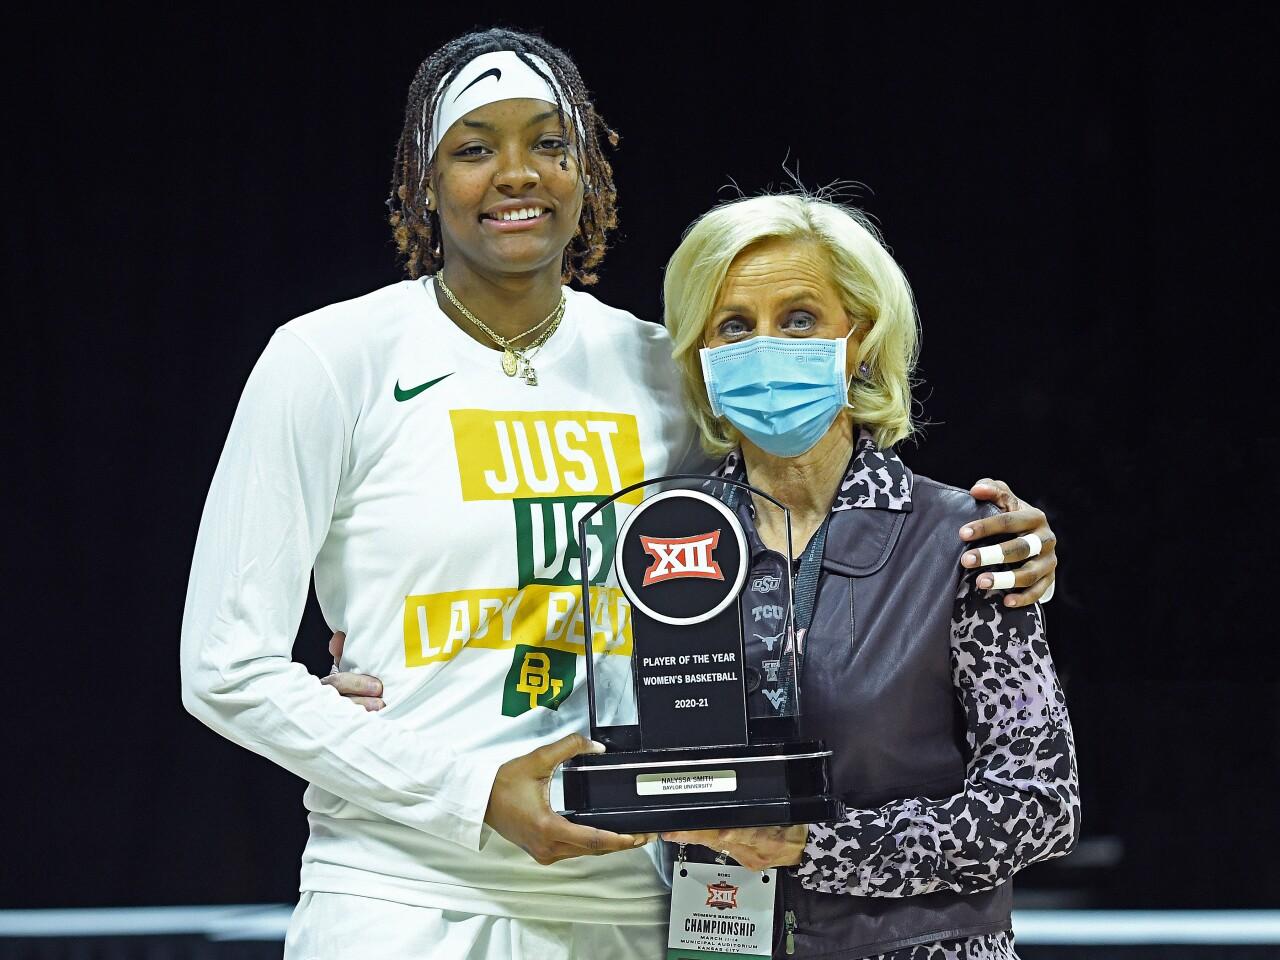 Phillips 66 Big 12 Women's Basketball Championship, March 12, 2021